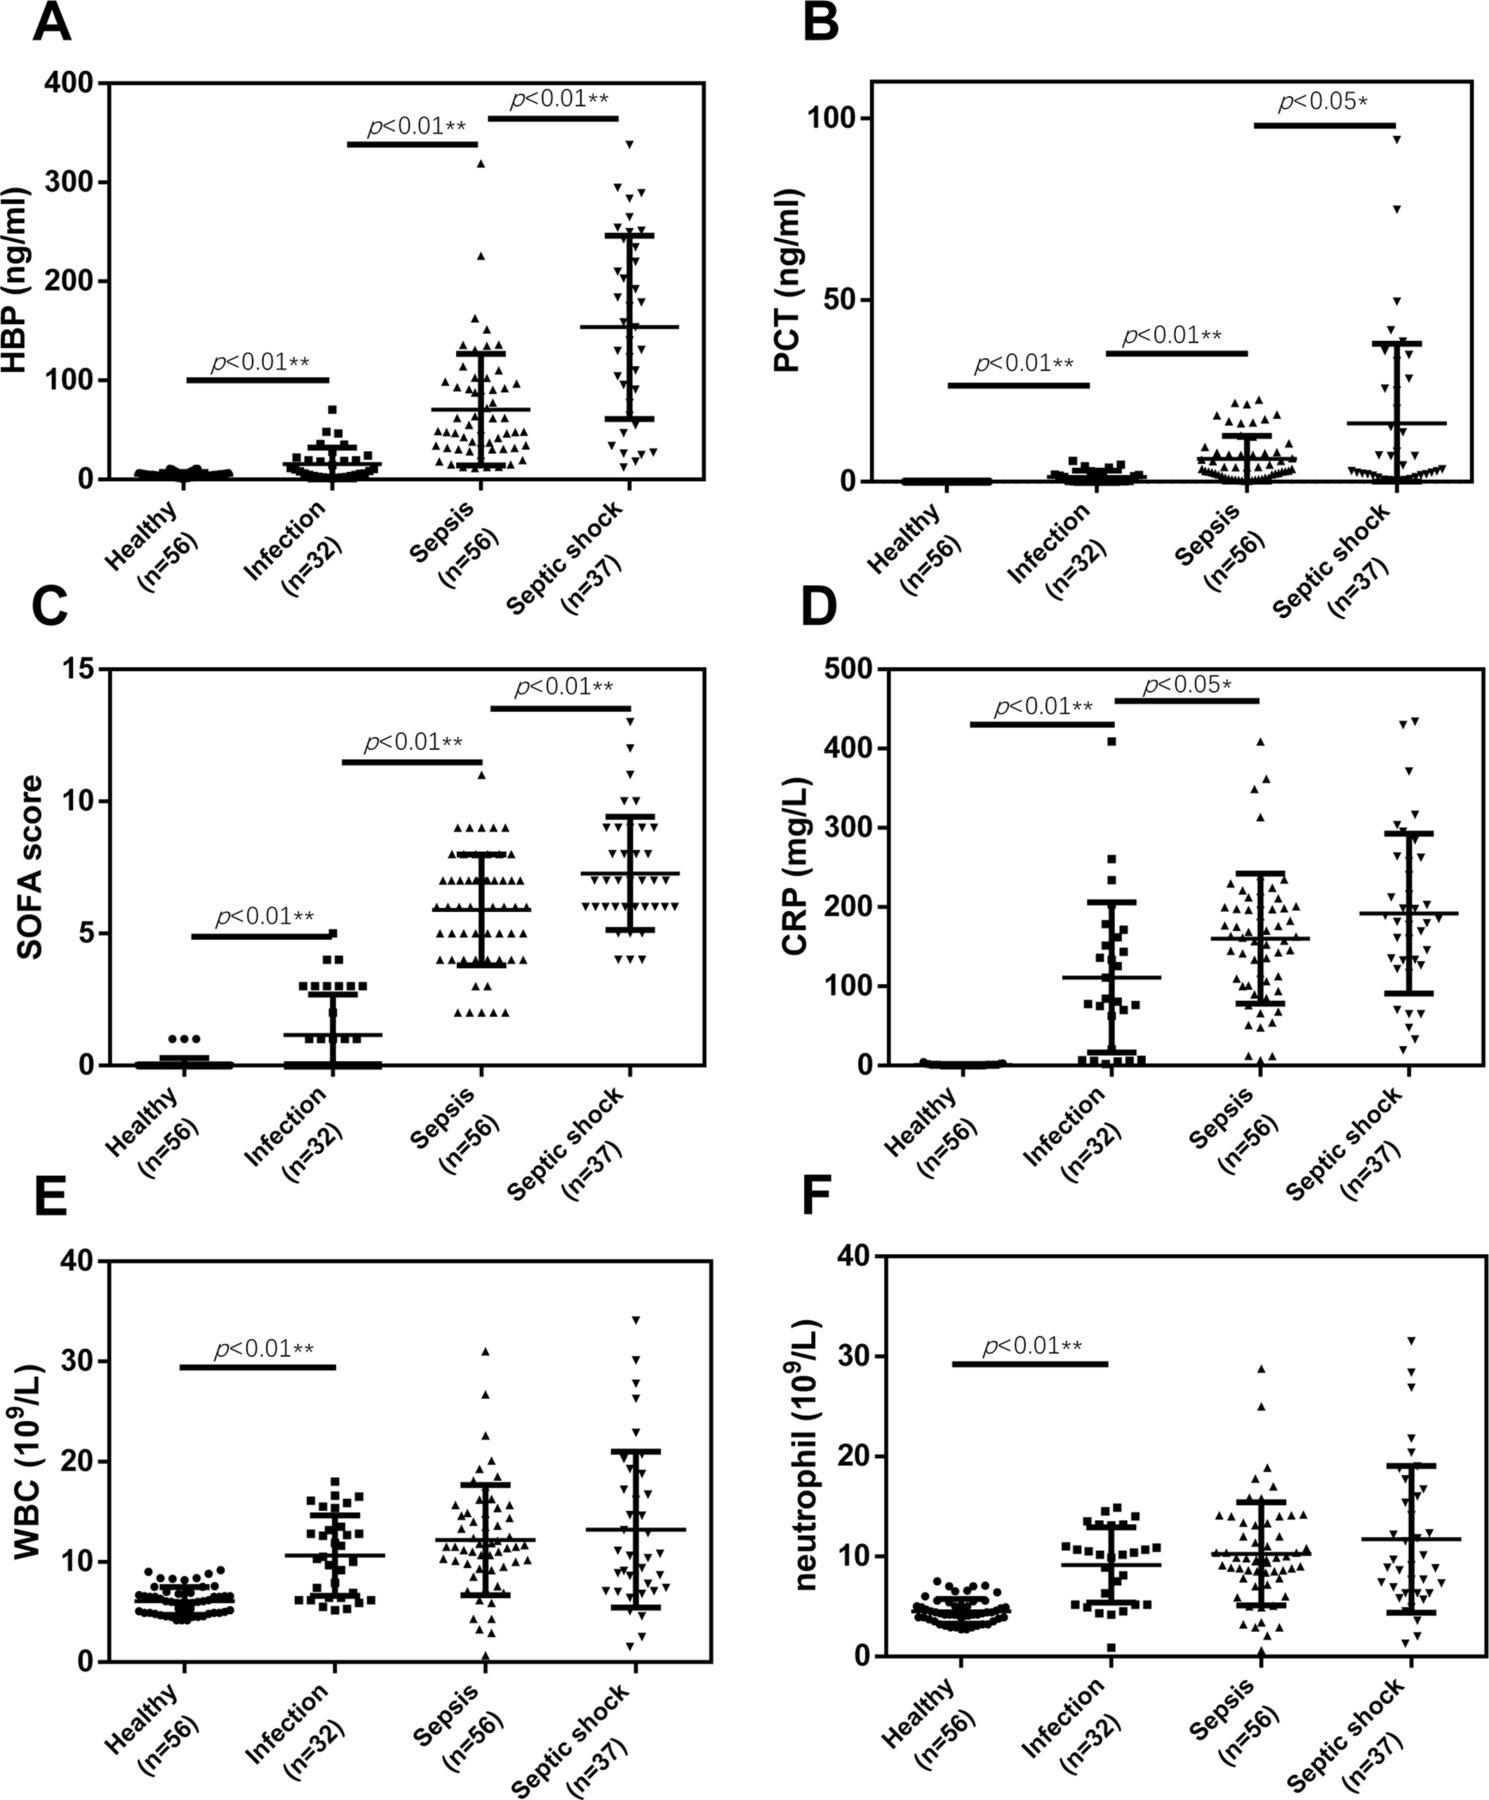 Usefulness Of The Heparin Binding Protein Level To